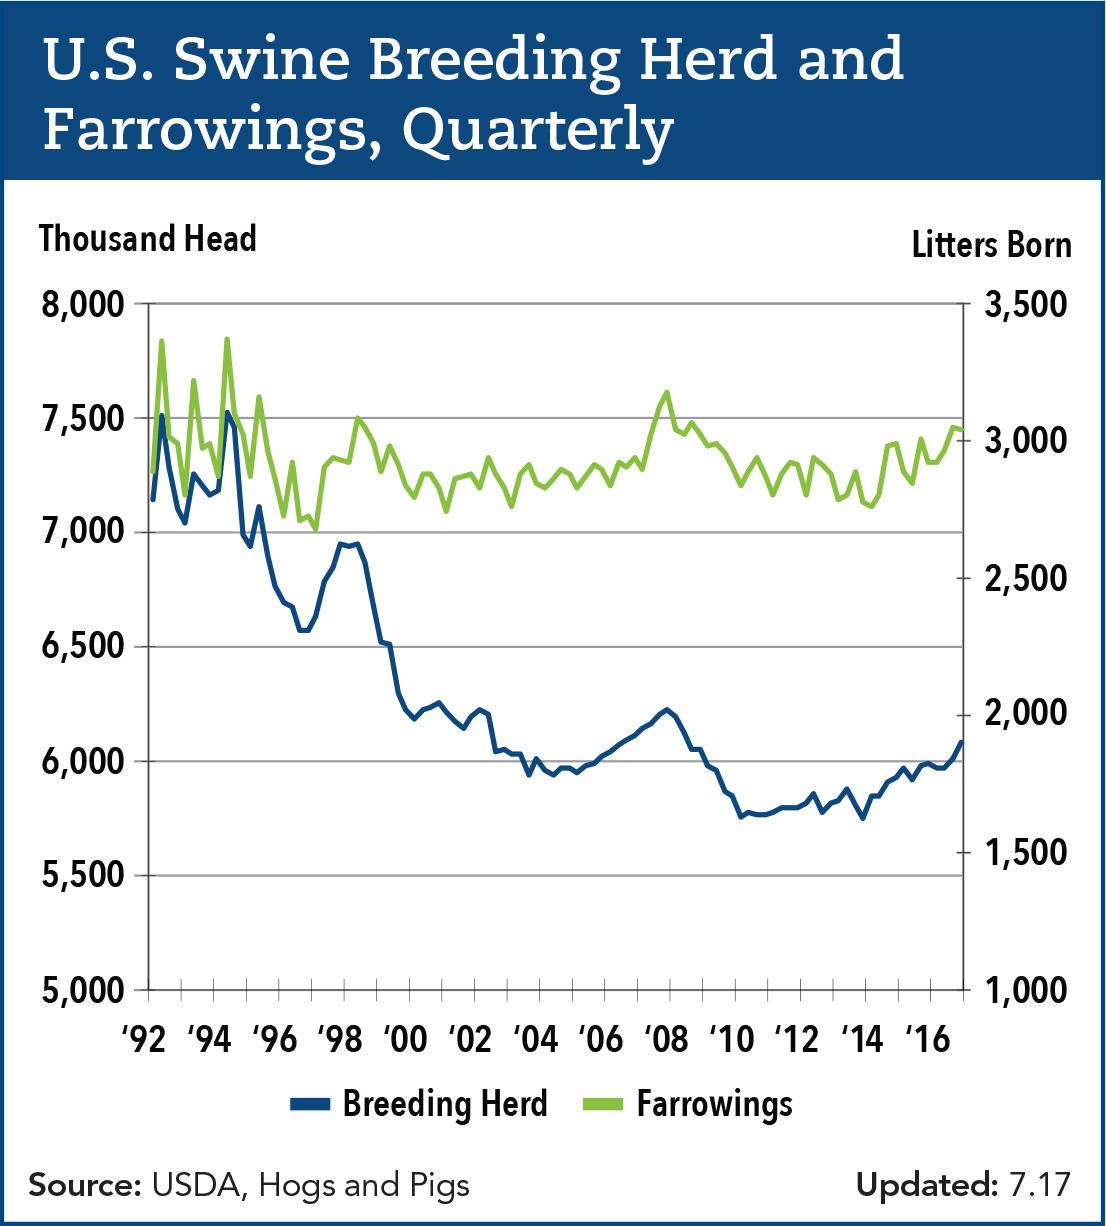 U.S. Swine Breeding Herd and Farrowings quarterly